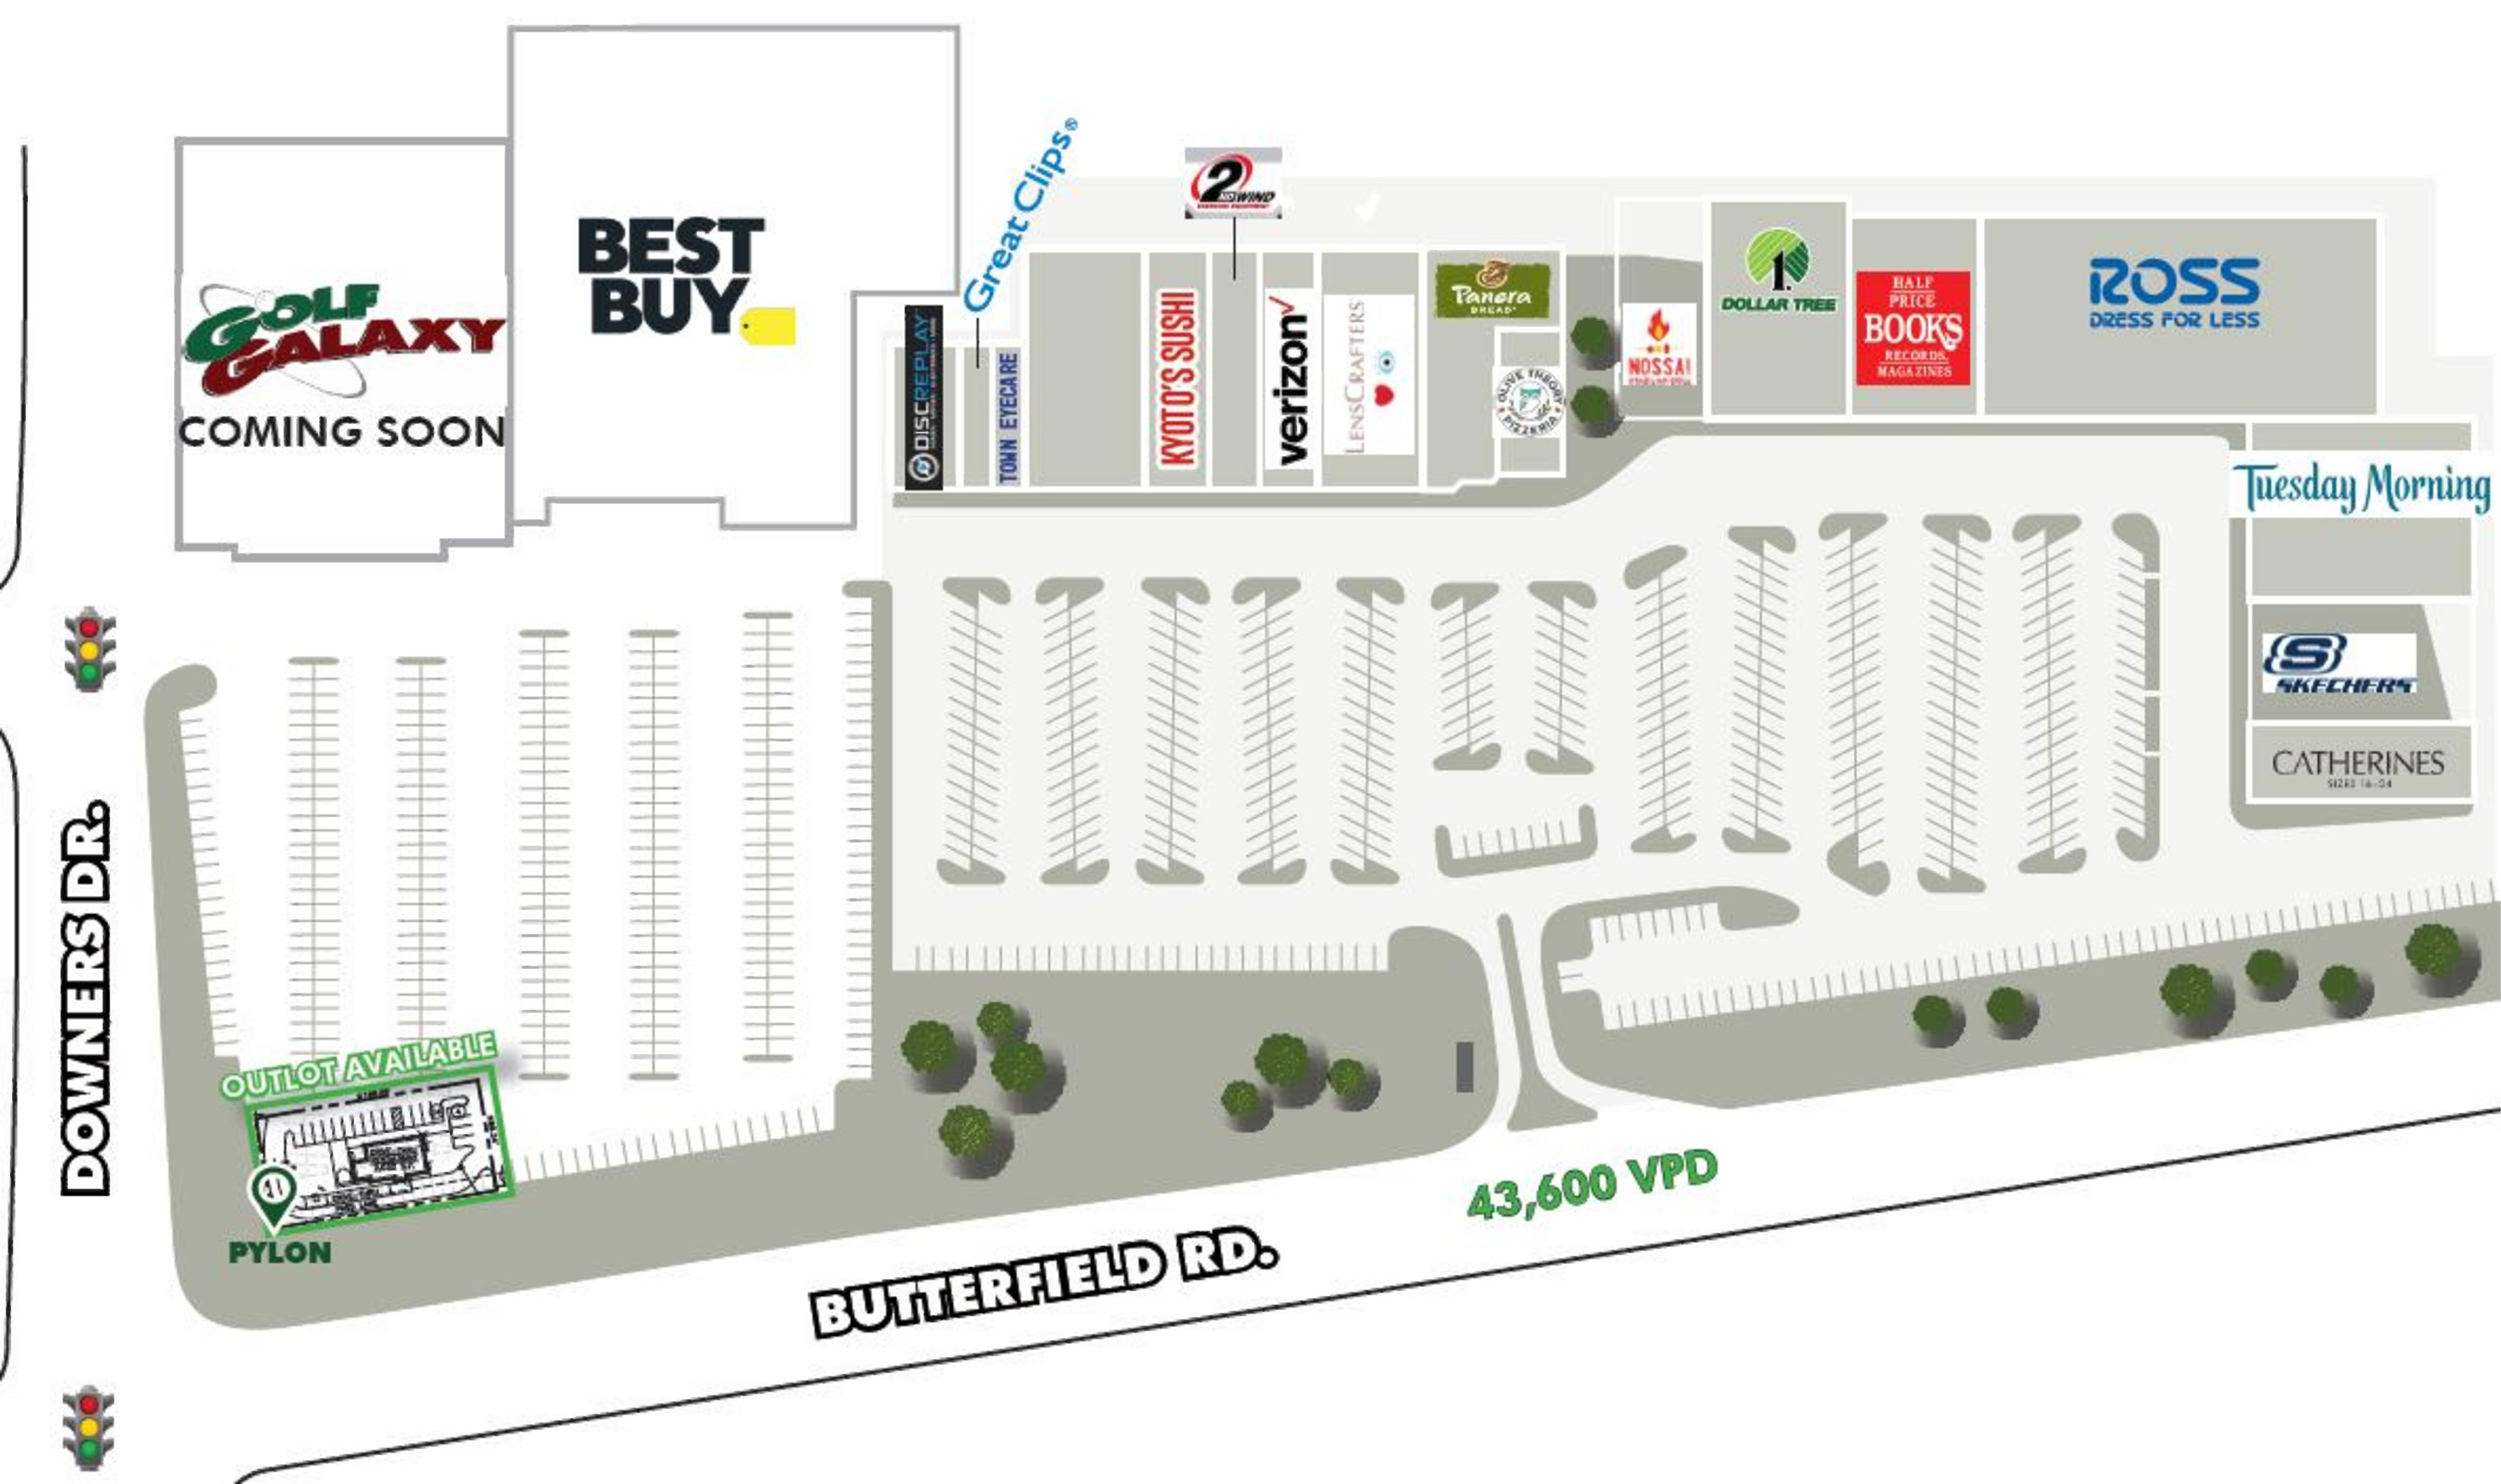 Butterfield Plaza: site plan